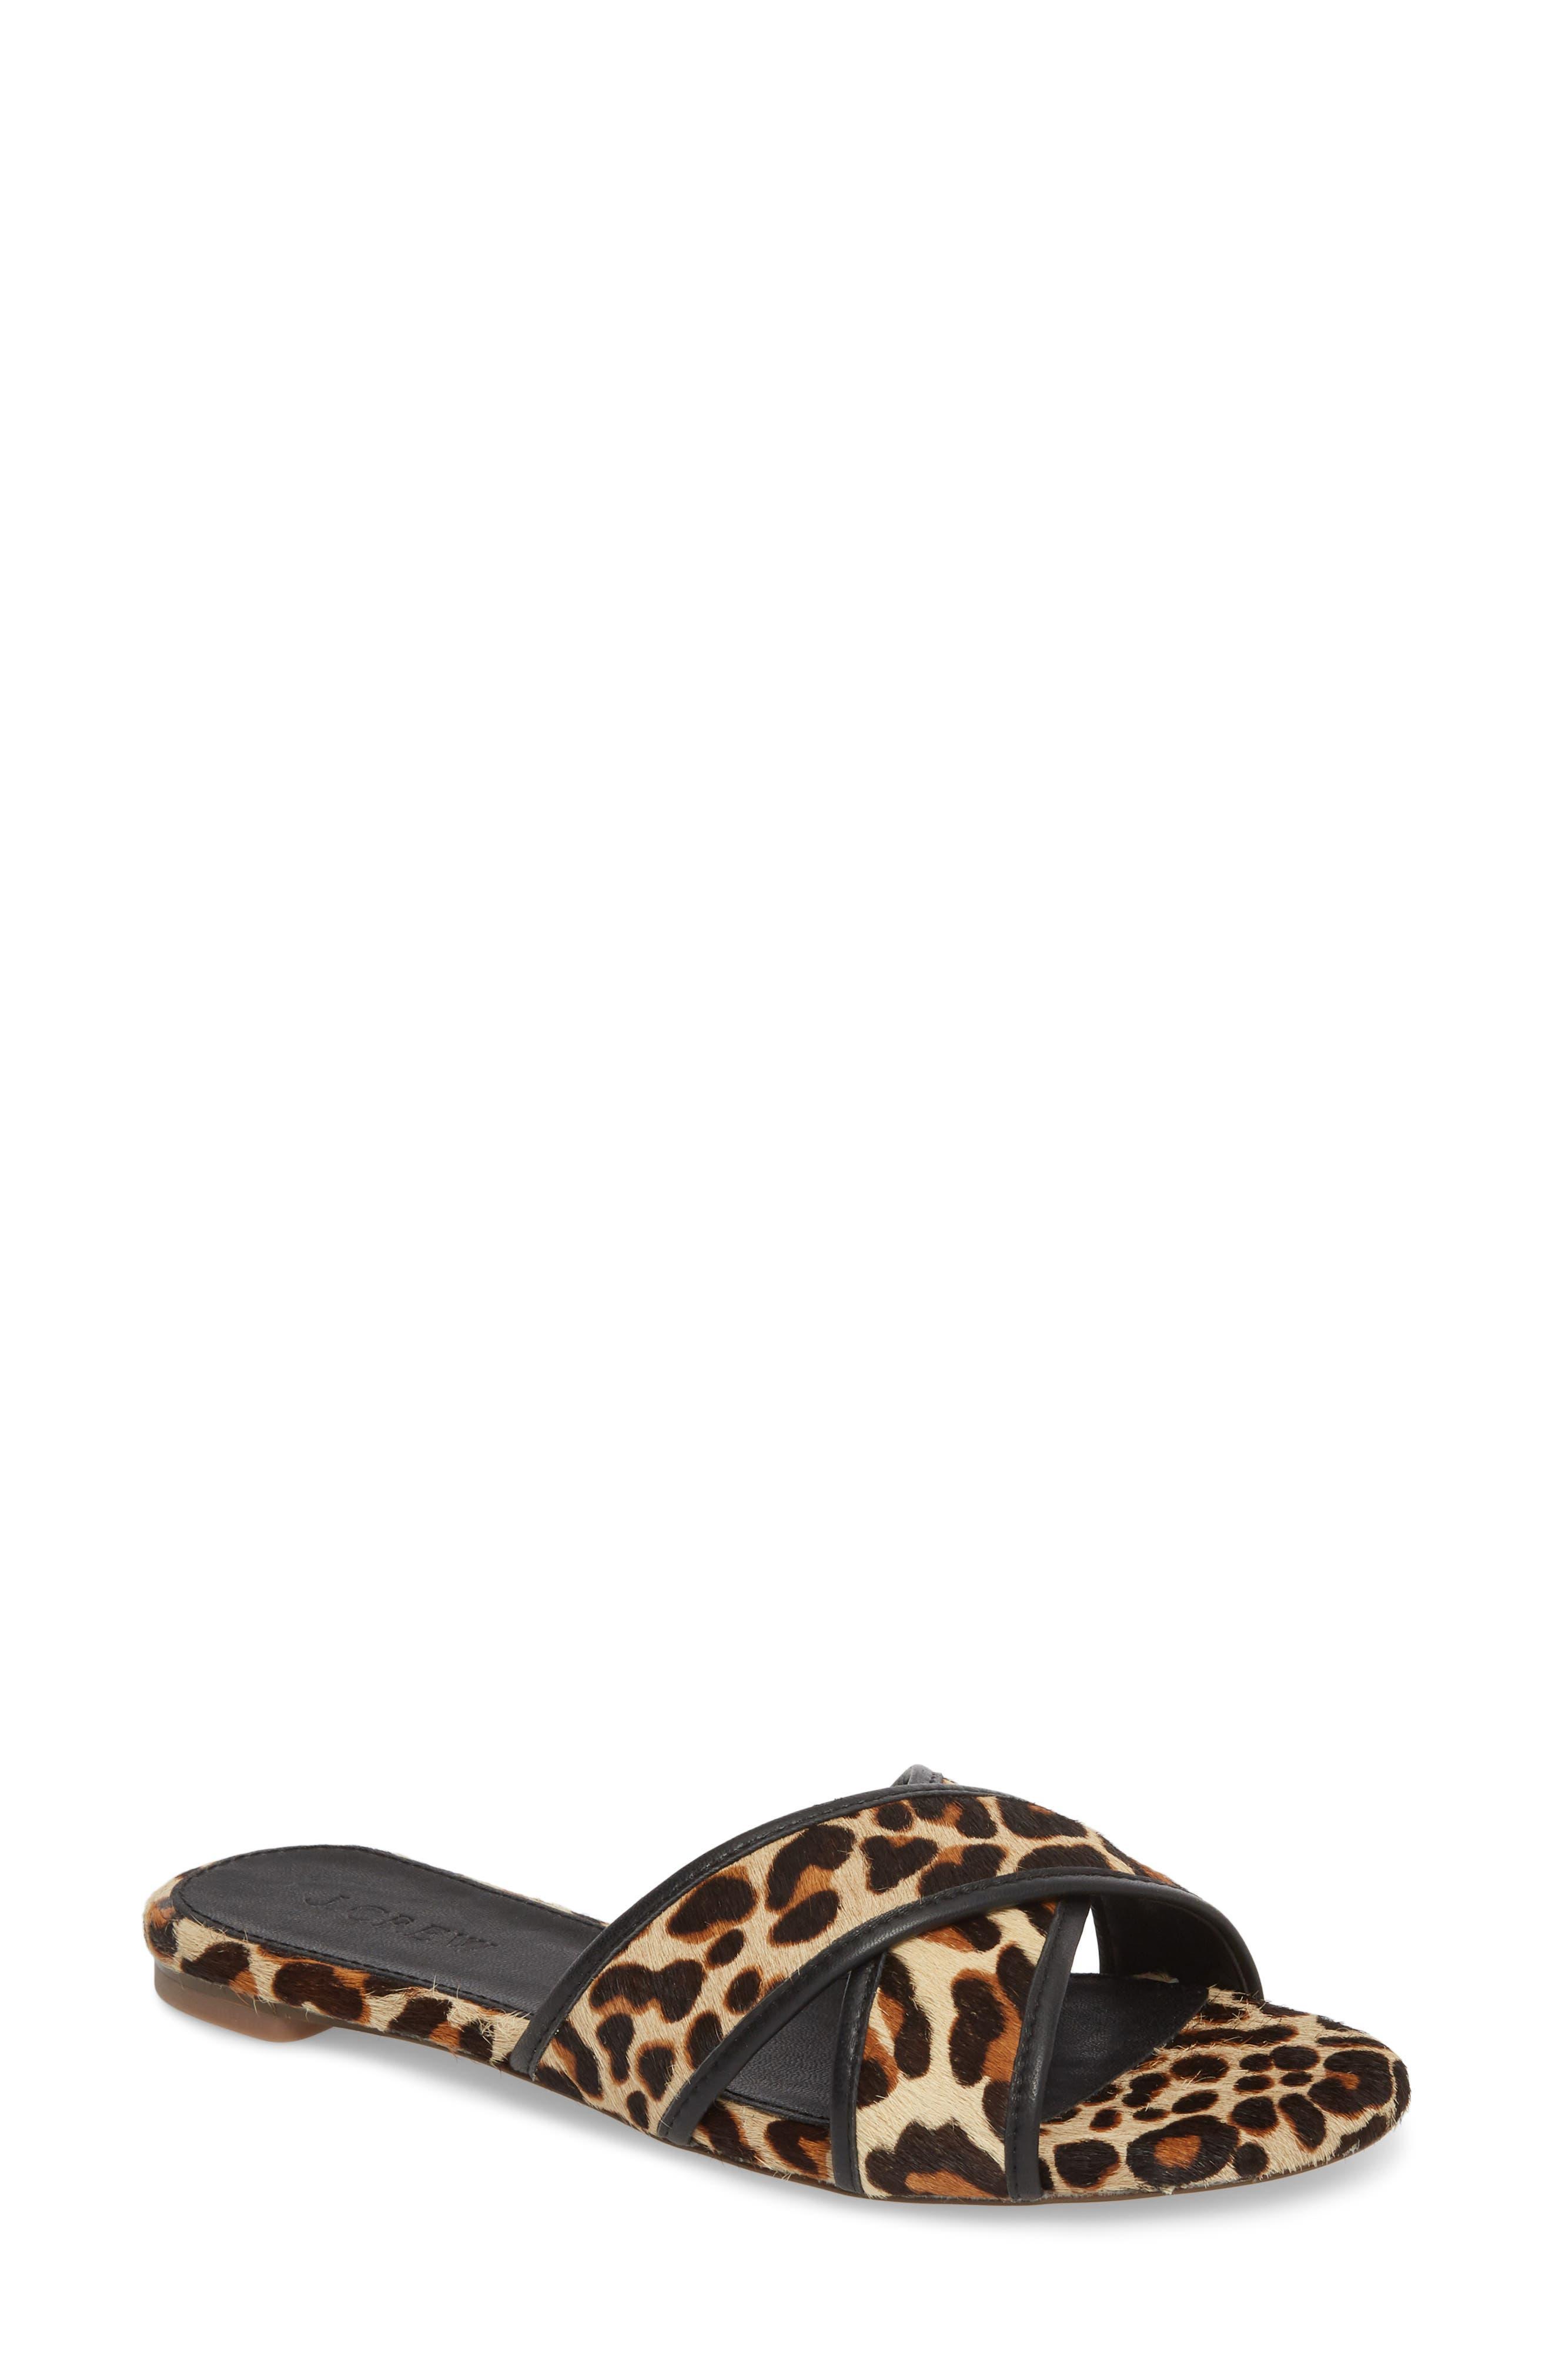 J.Crew Women's Cora Genuine Calf Hair Slide Sandal